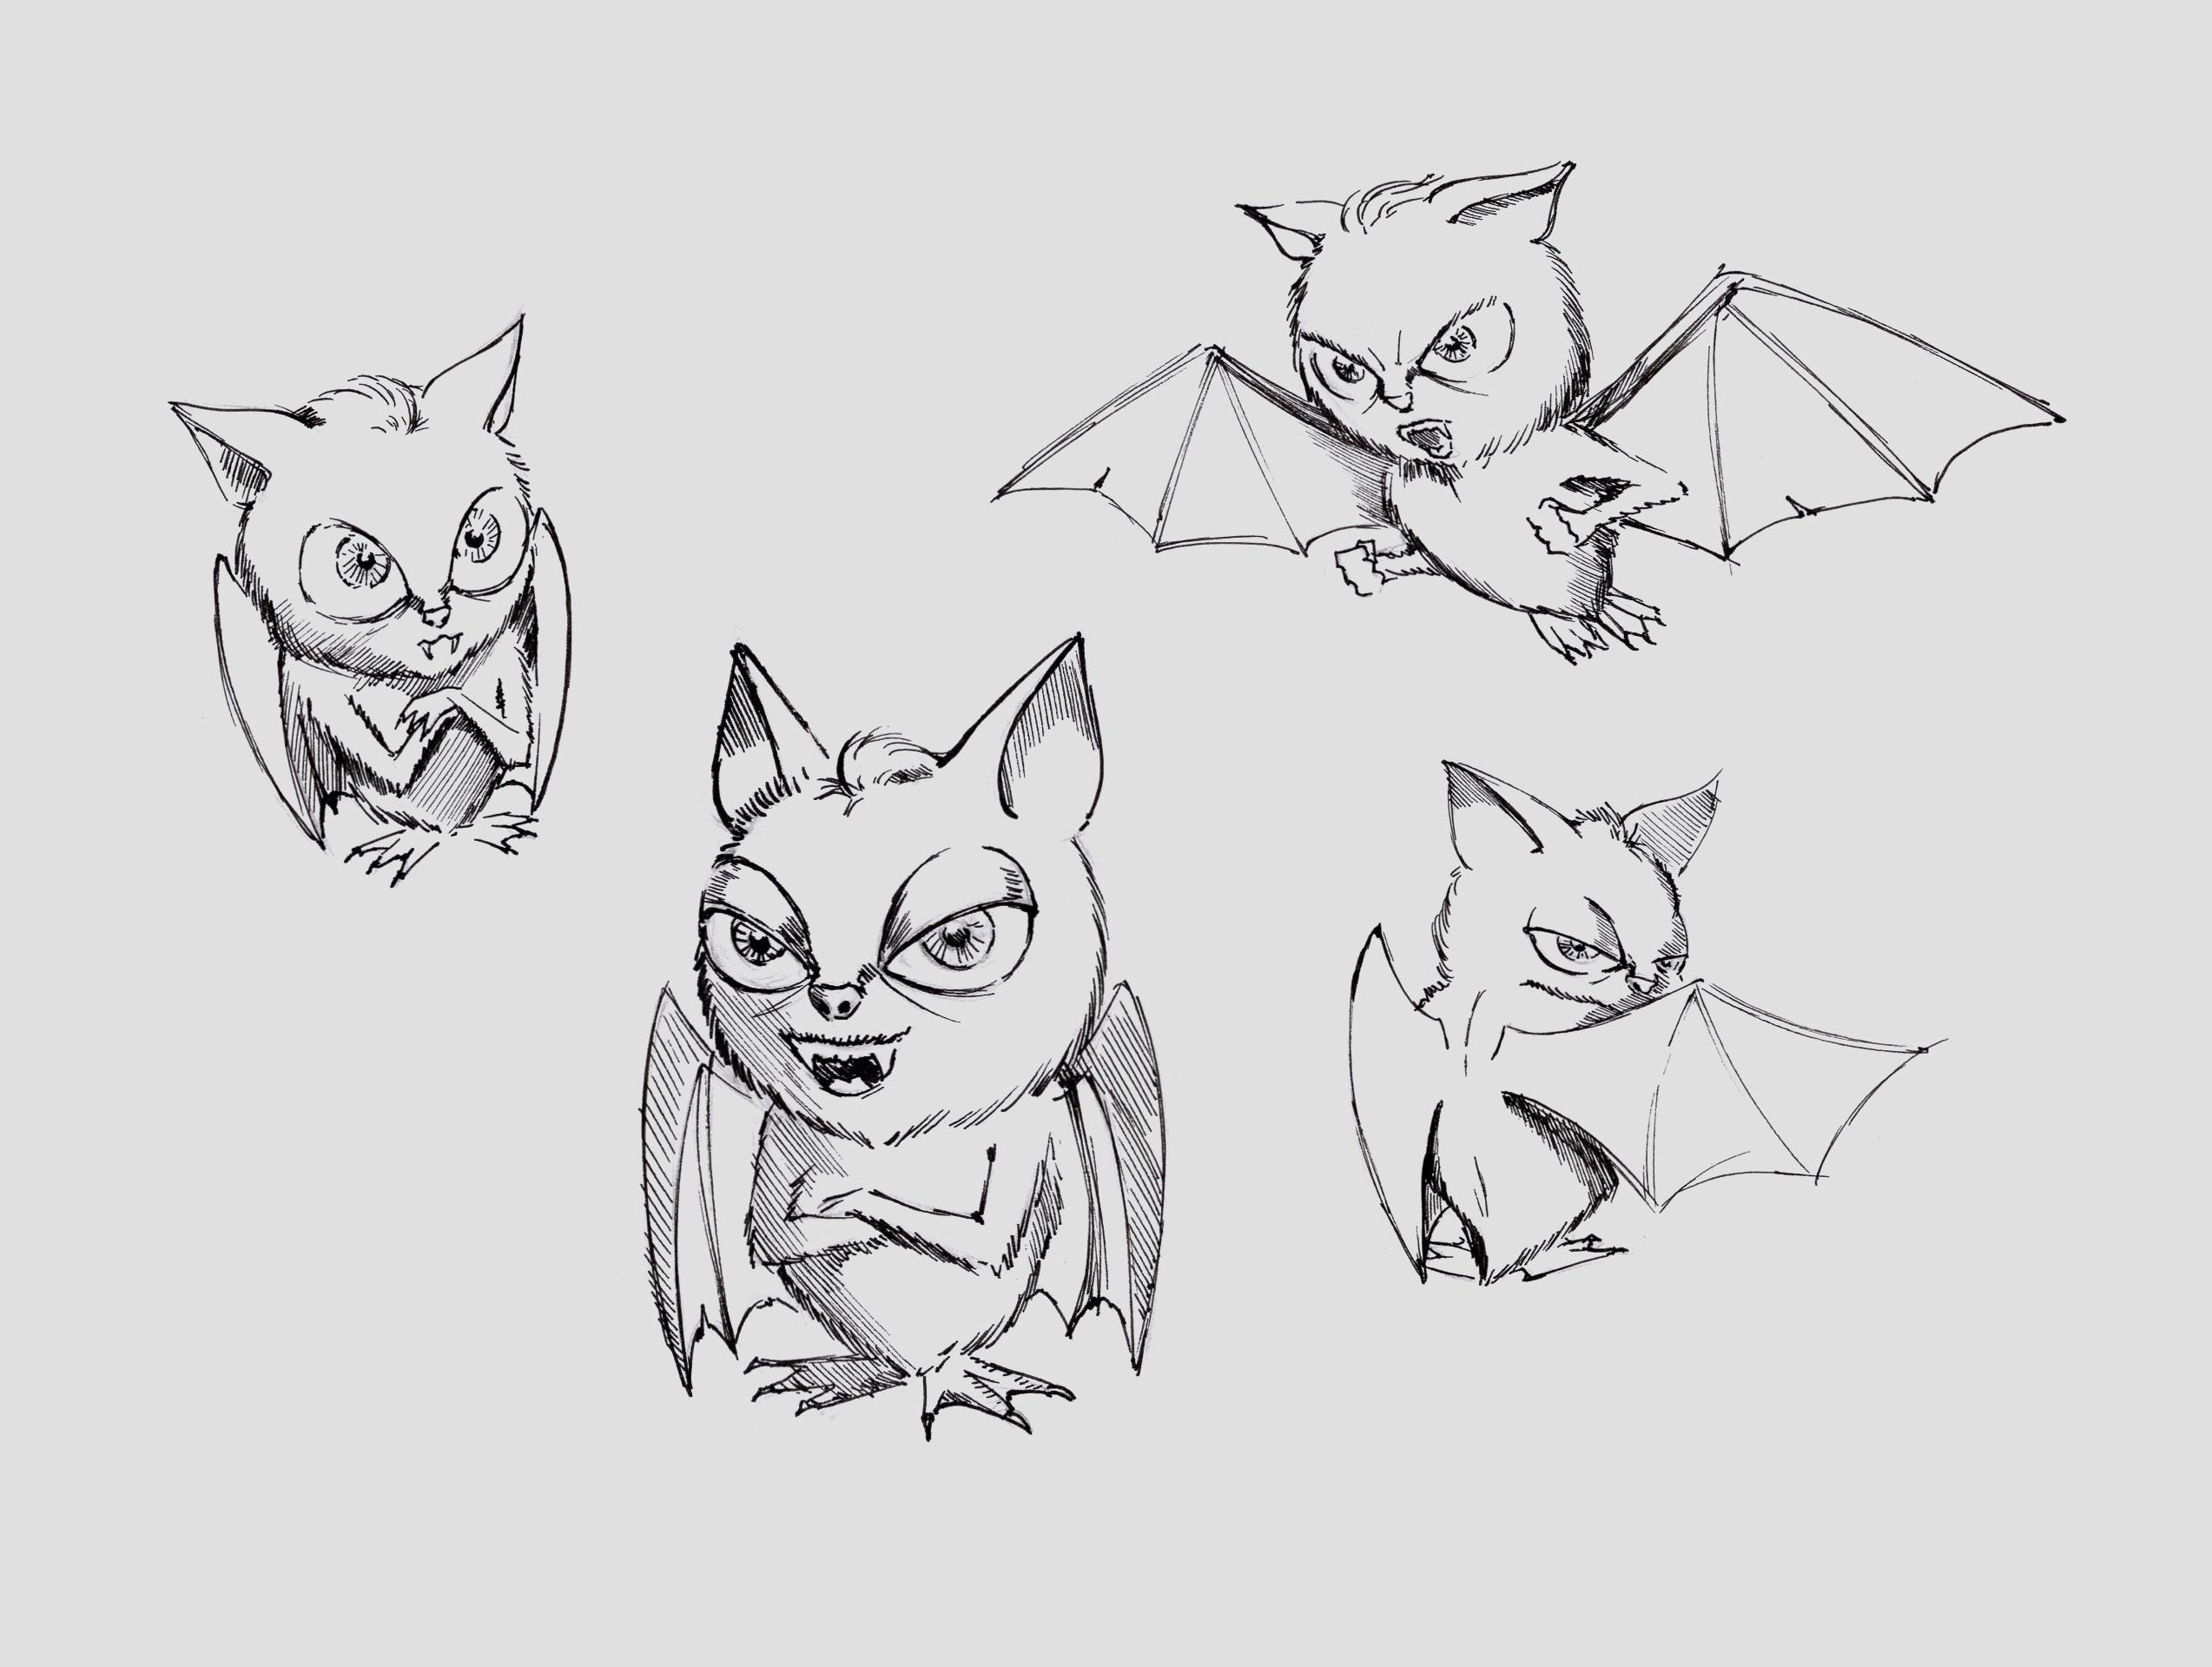 Нарисовать персонажа для анимации фото f_3025c869bf07dfd4.jpg